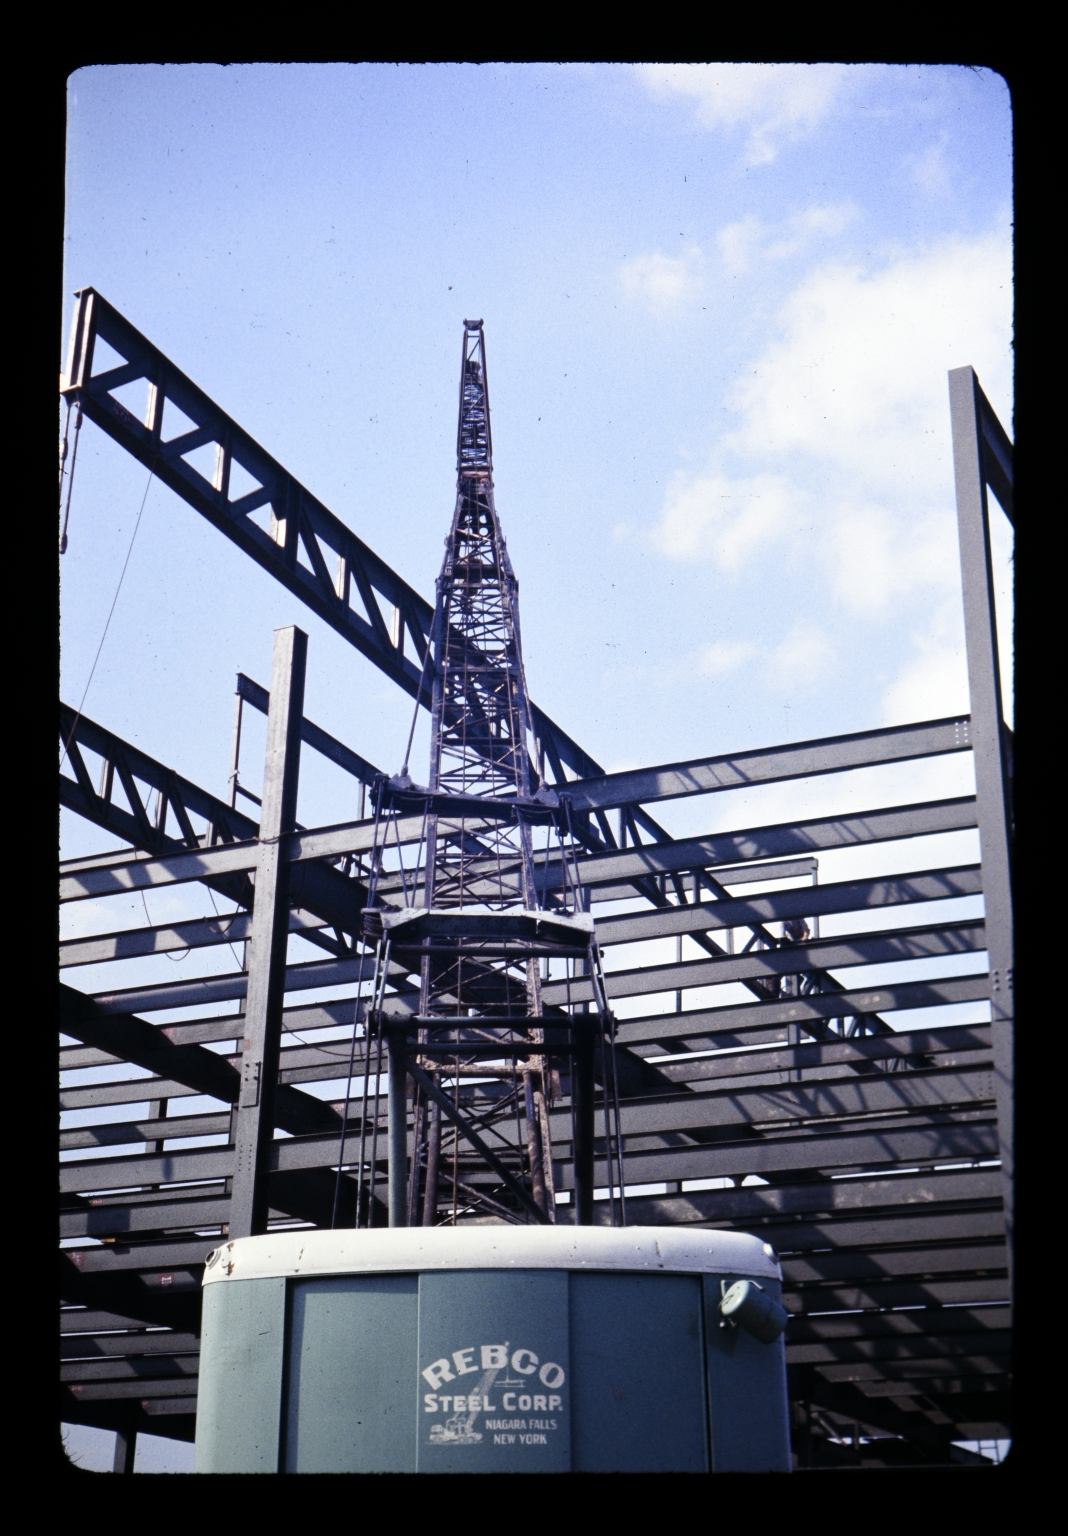 Steel framework of a building